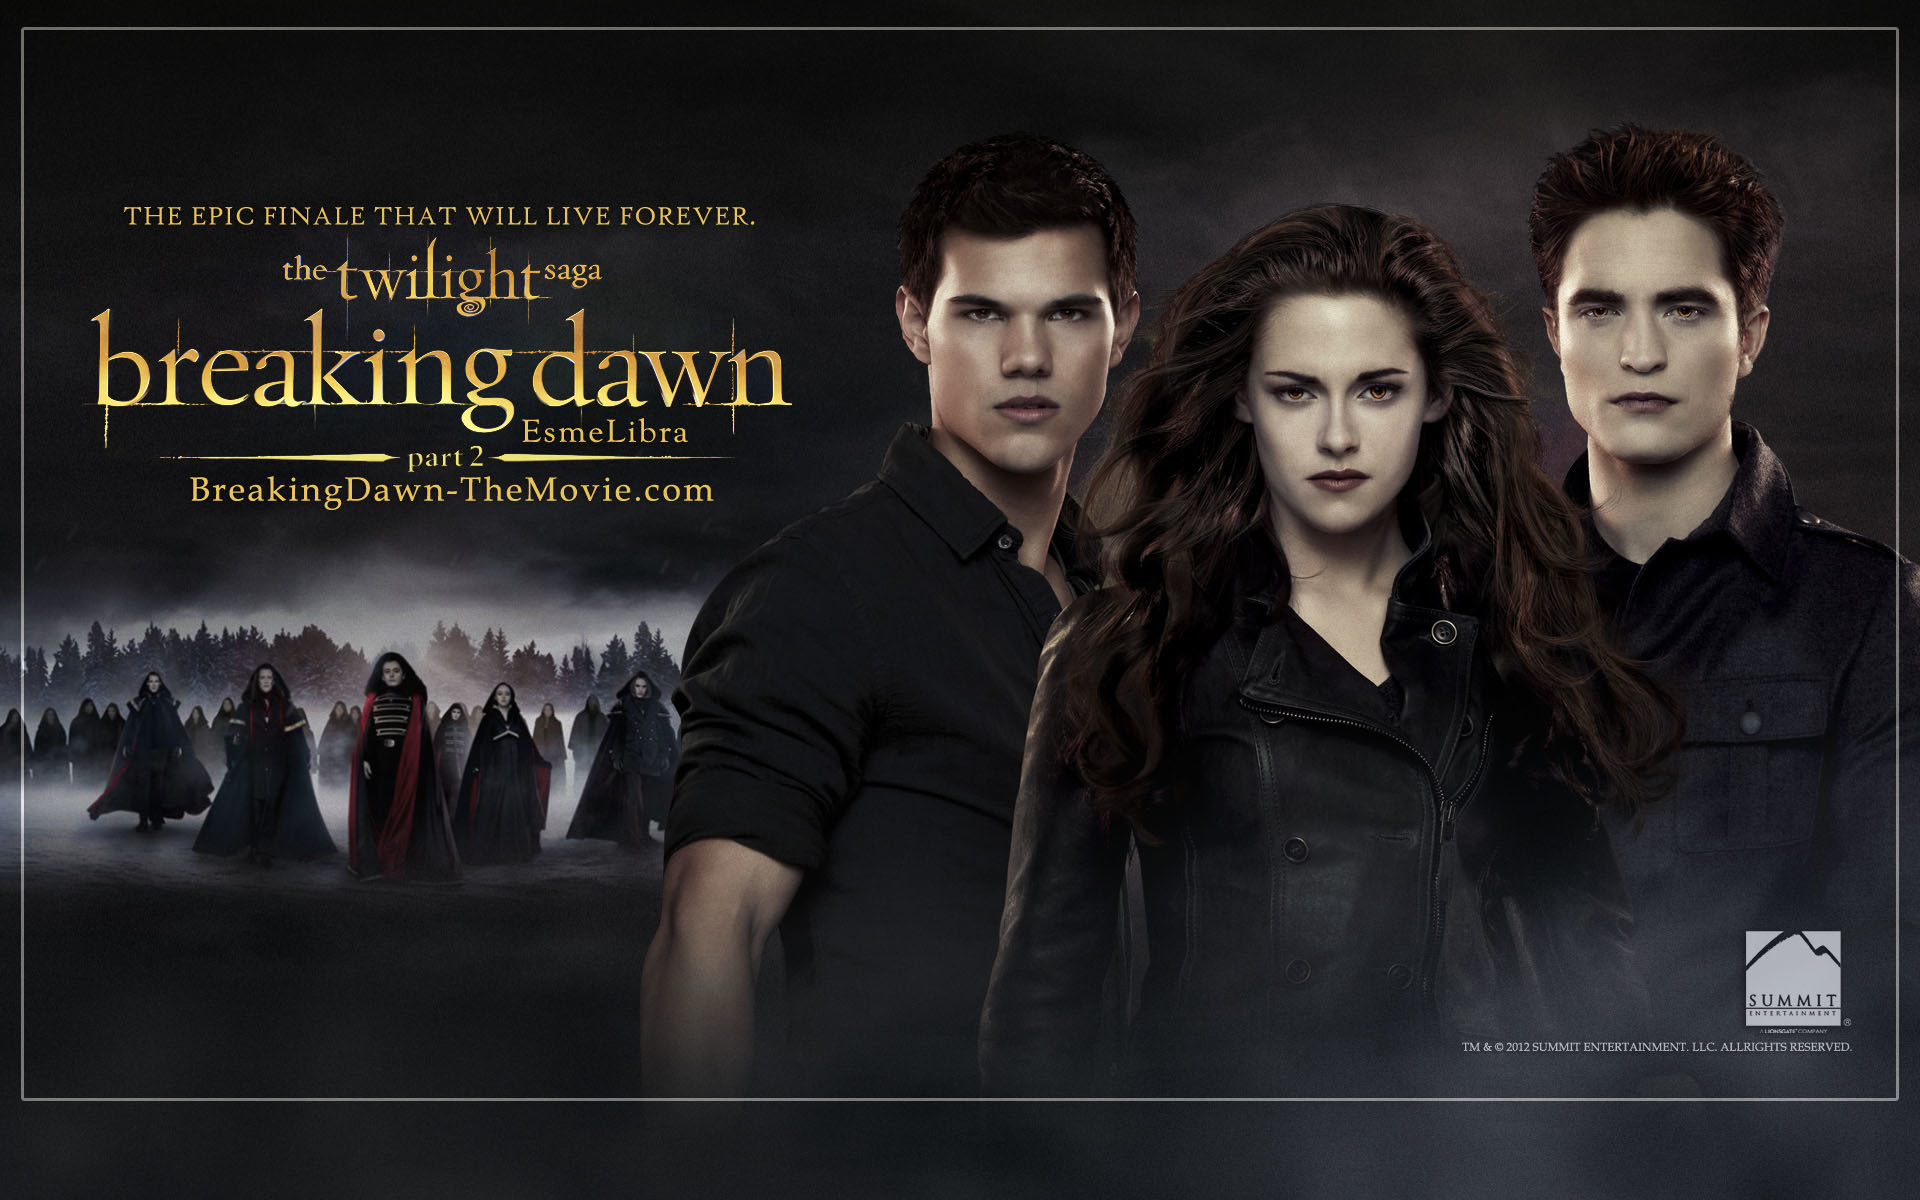 Twilight breaking dawn wallpaper 62 images - Twilight wallpaper ...